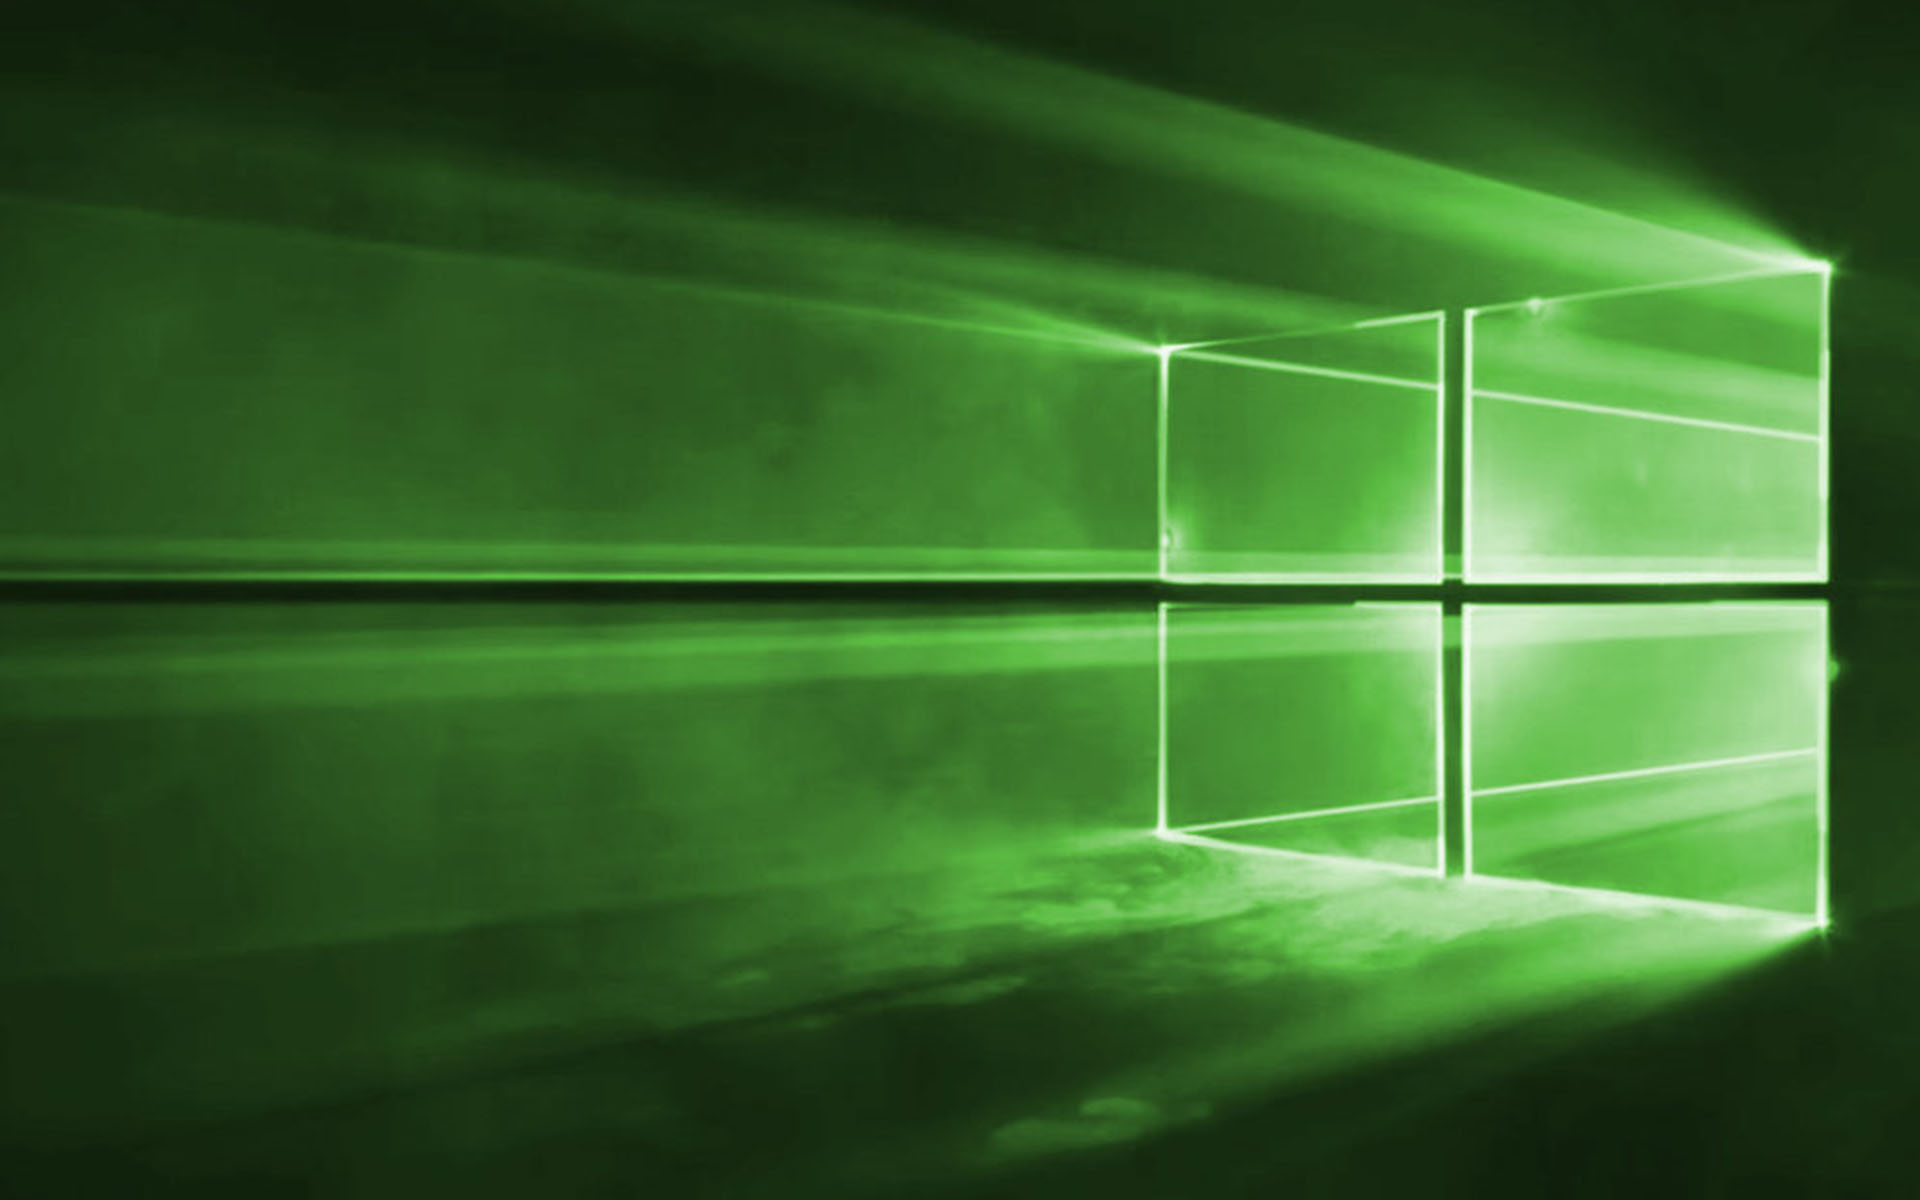 Cute Windows 10 Wallpaper